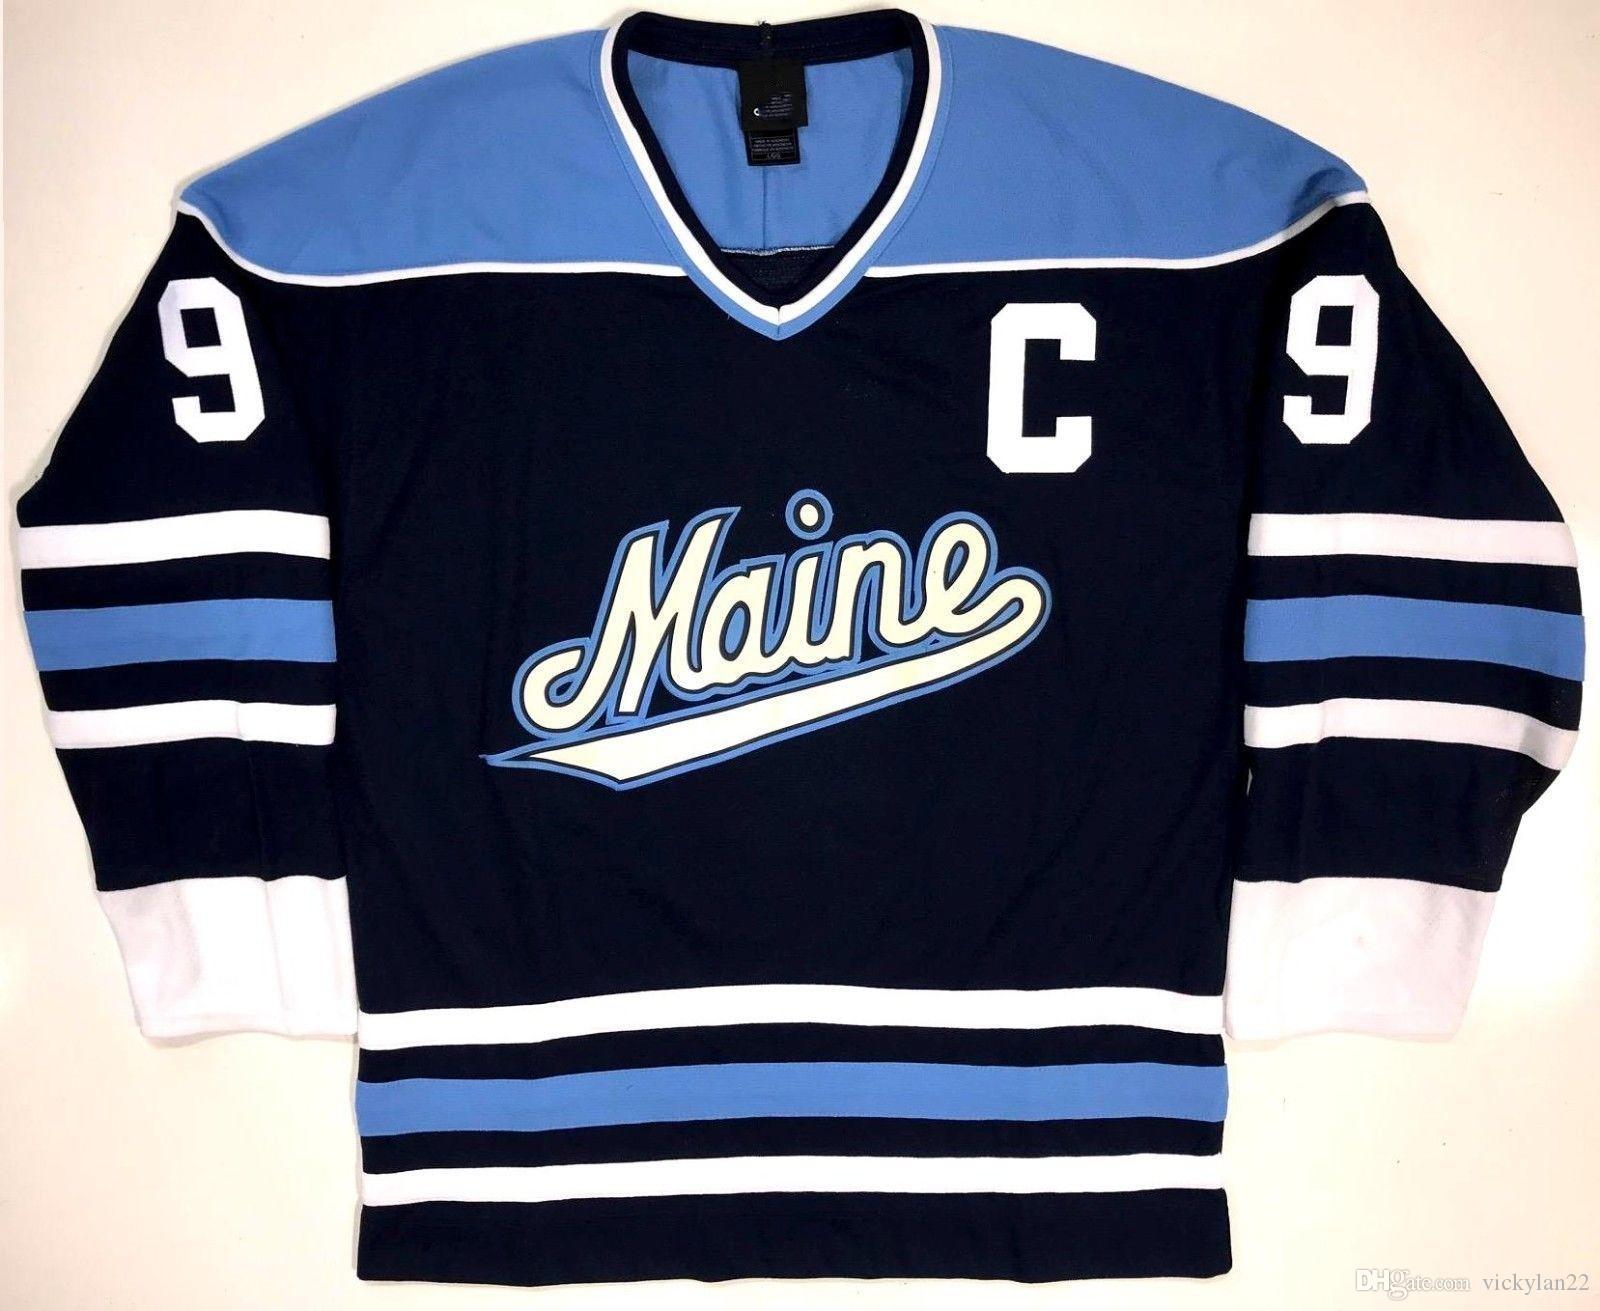 ... Black Bears   9 Paul Kariya Hockey Jersey Вышивка Сшитая Настройте  Любое Количество И Название Jerseys. Отvickylan22 В Категории  ca999147d5f